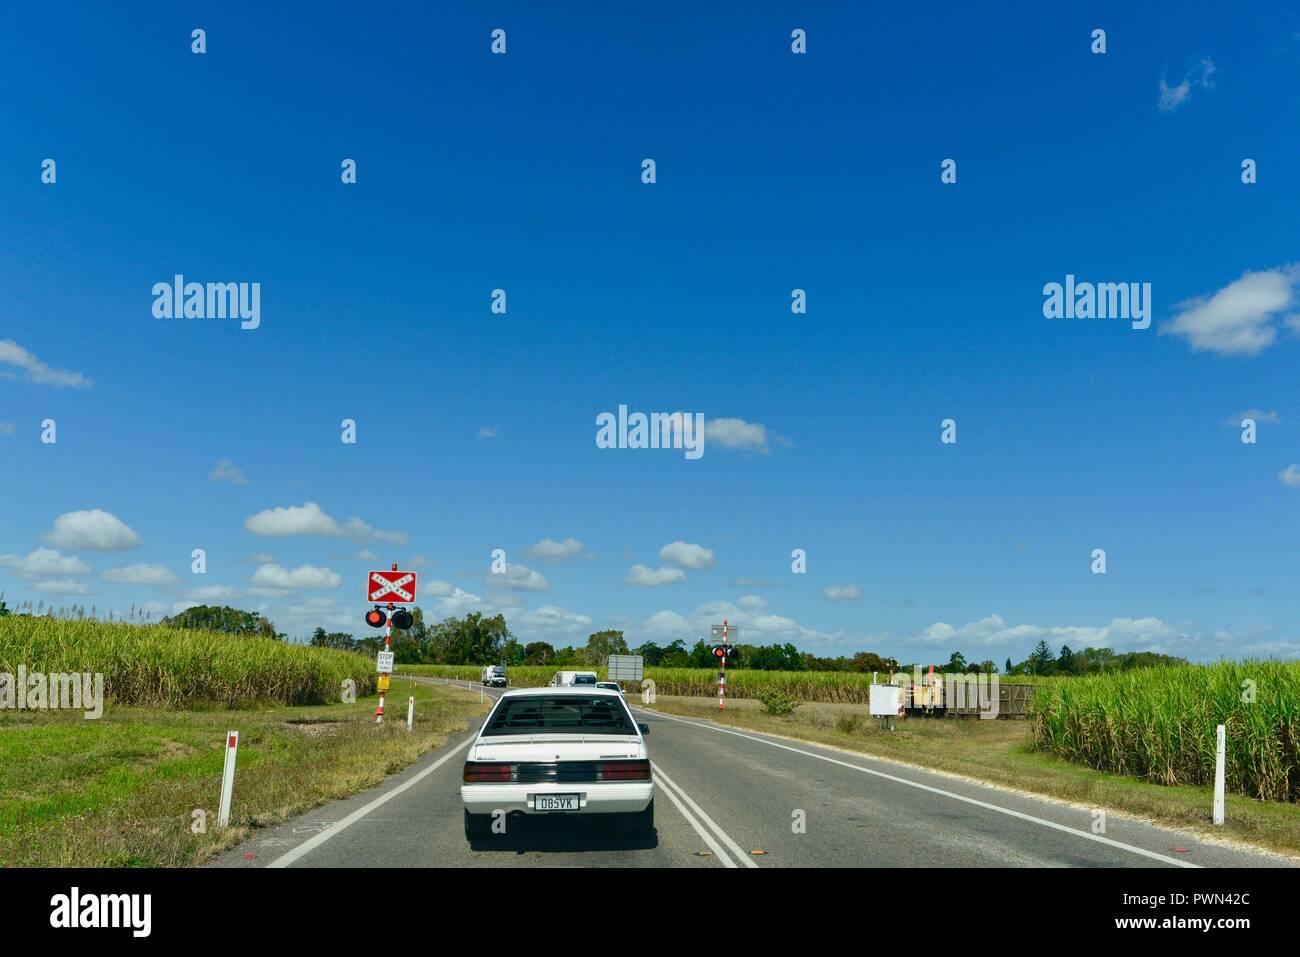 Sugarcane train crossing a road at a train crossing, Ingham, QLD, Australia Stock Photo